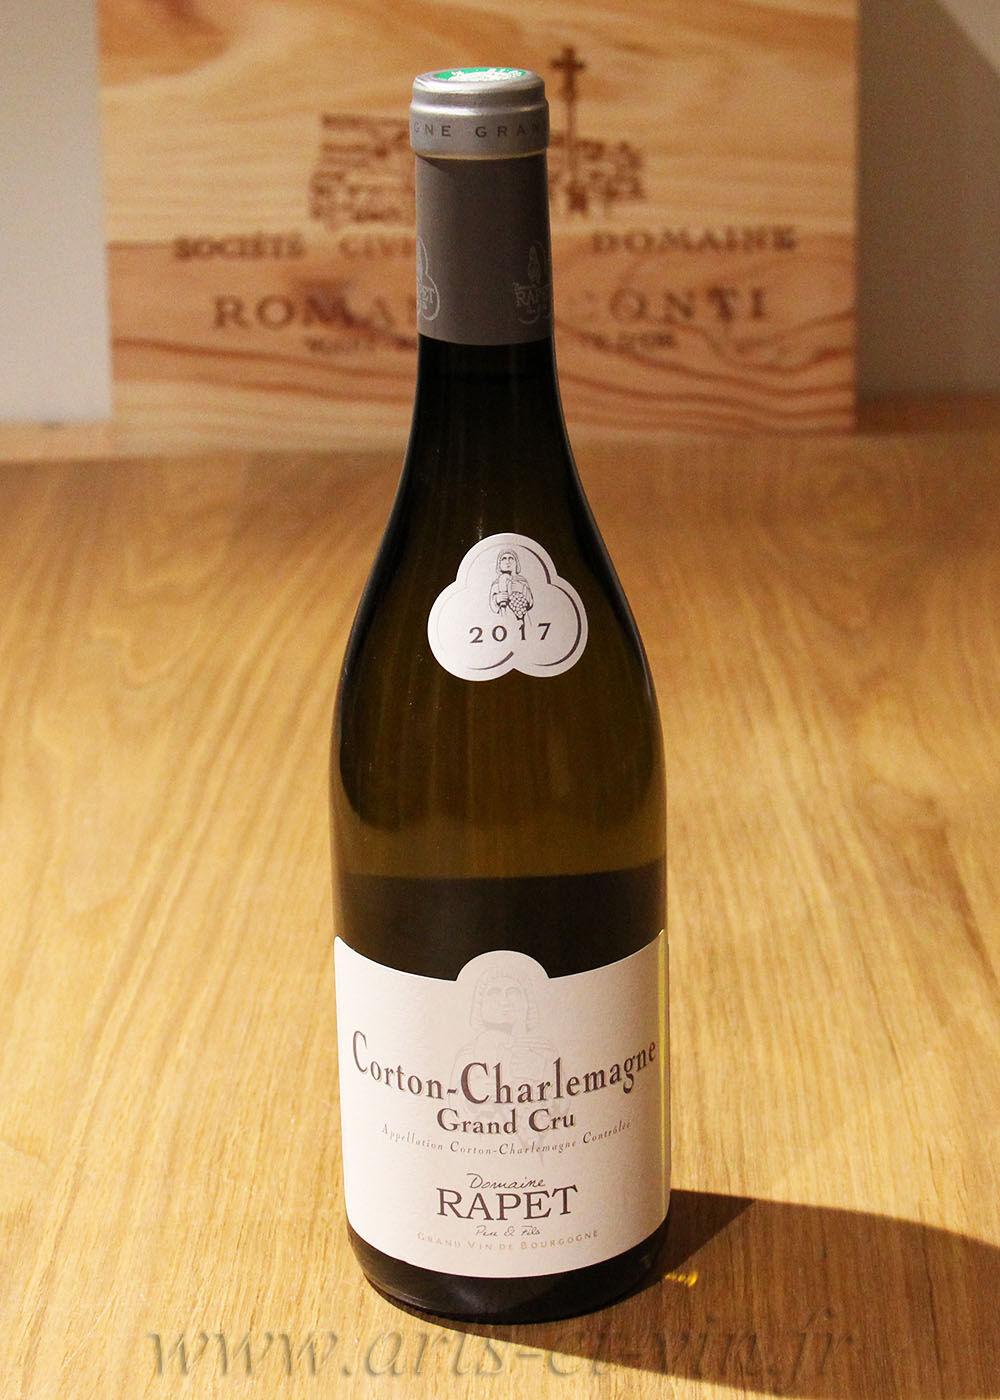 Bourgogne Corton-Charlemagne Grand Cru 2017 - Domaine Rapet